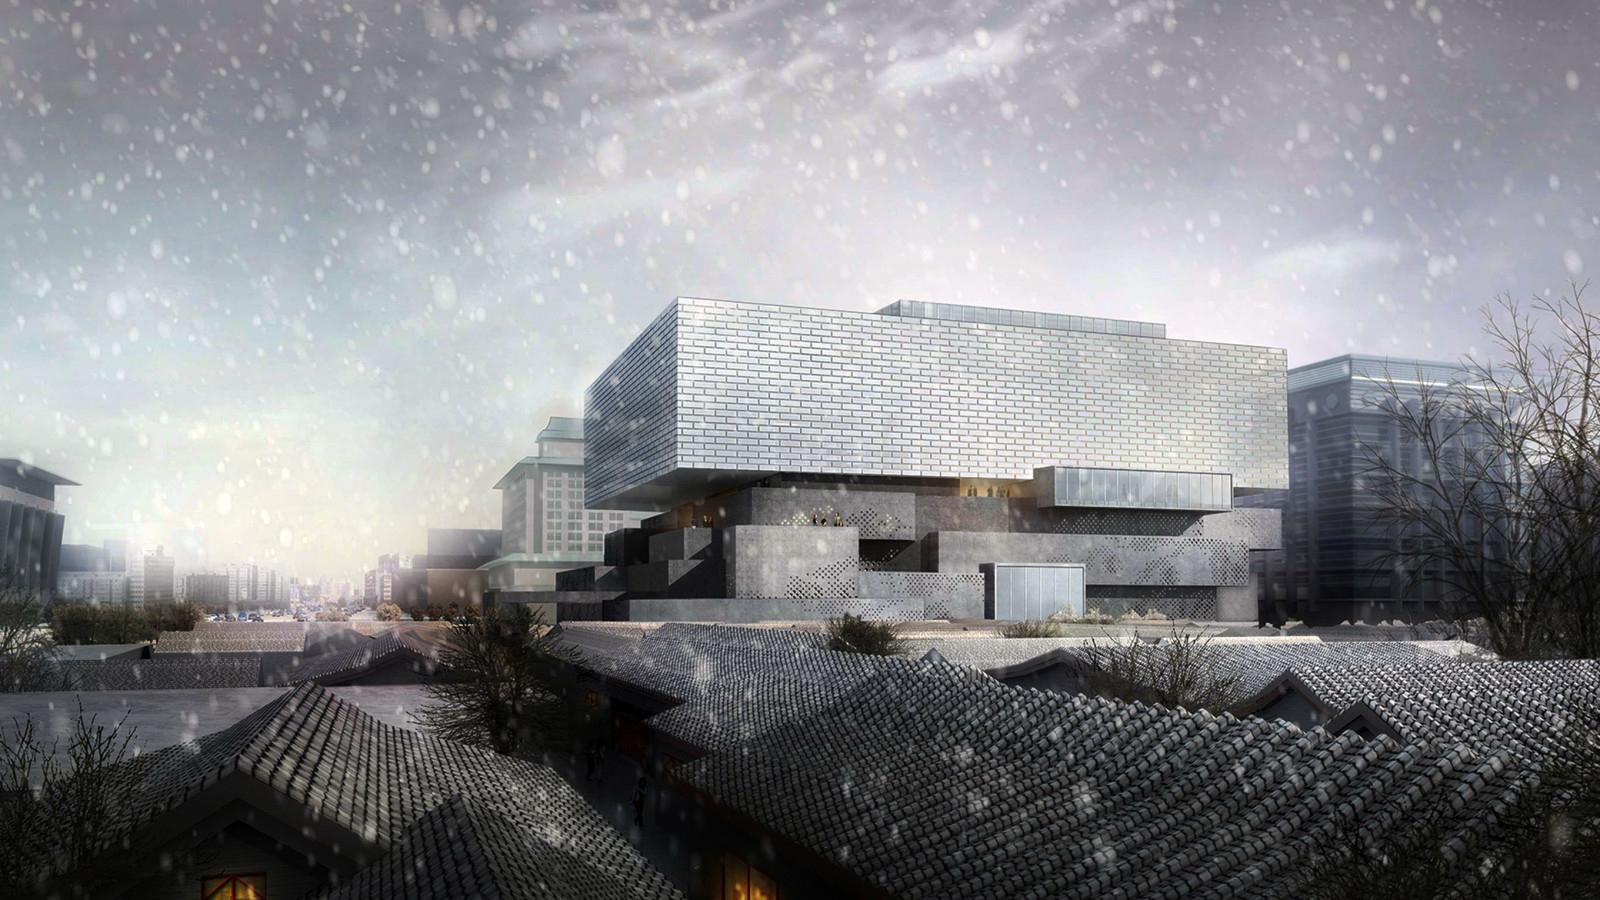 10 new museums opening in 2018: Guardian Art Center by Buro Ole Scheeren